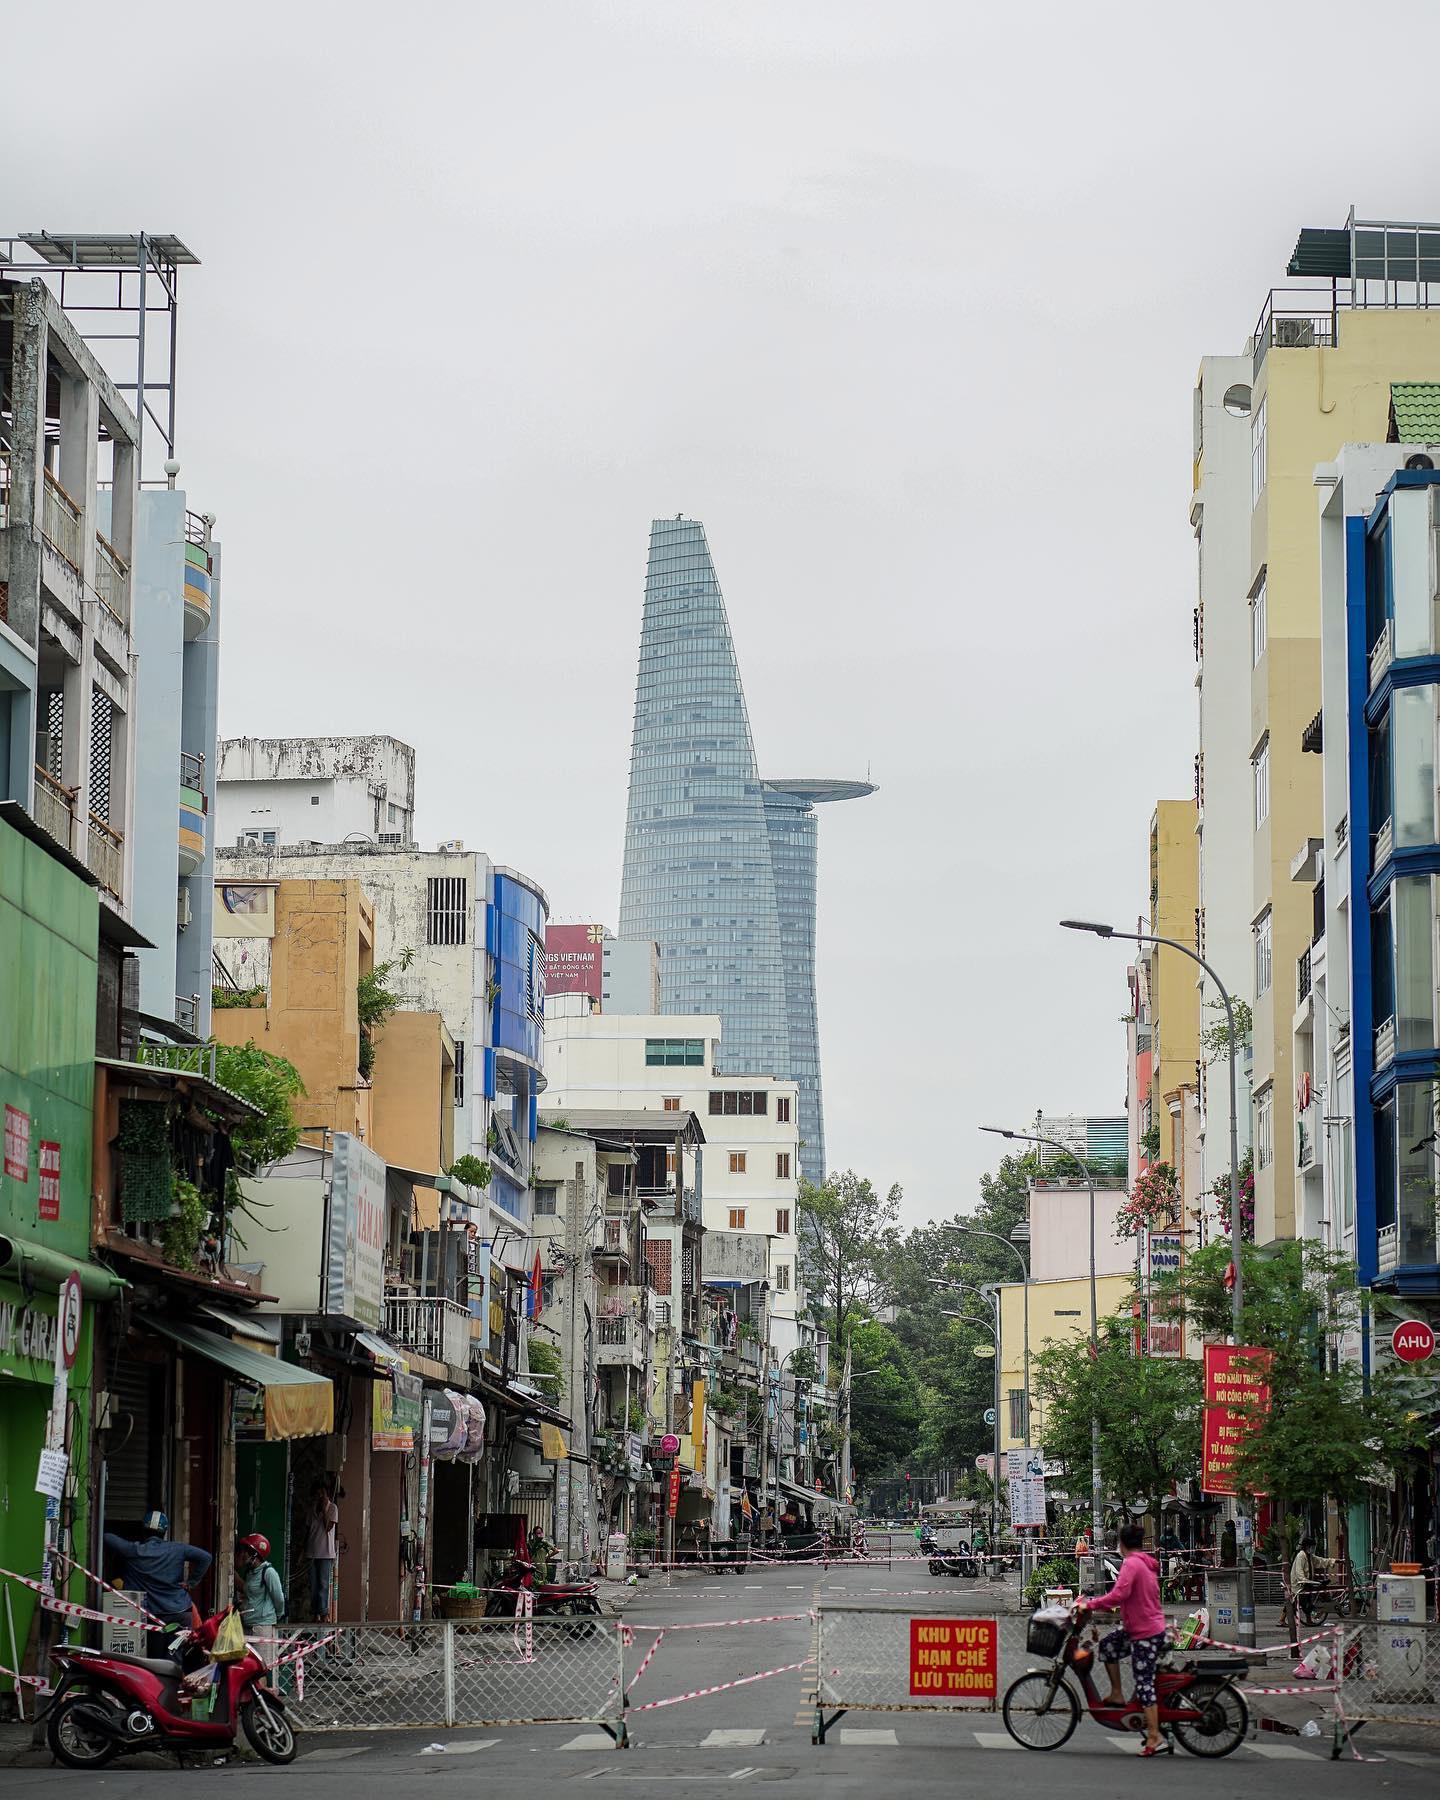 In Photos: Covid Cuties Cheer Up Lockdown Saigon